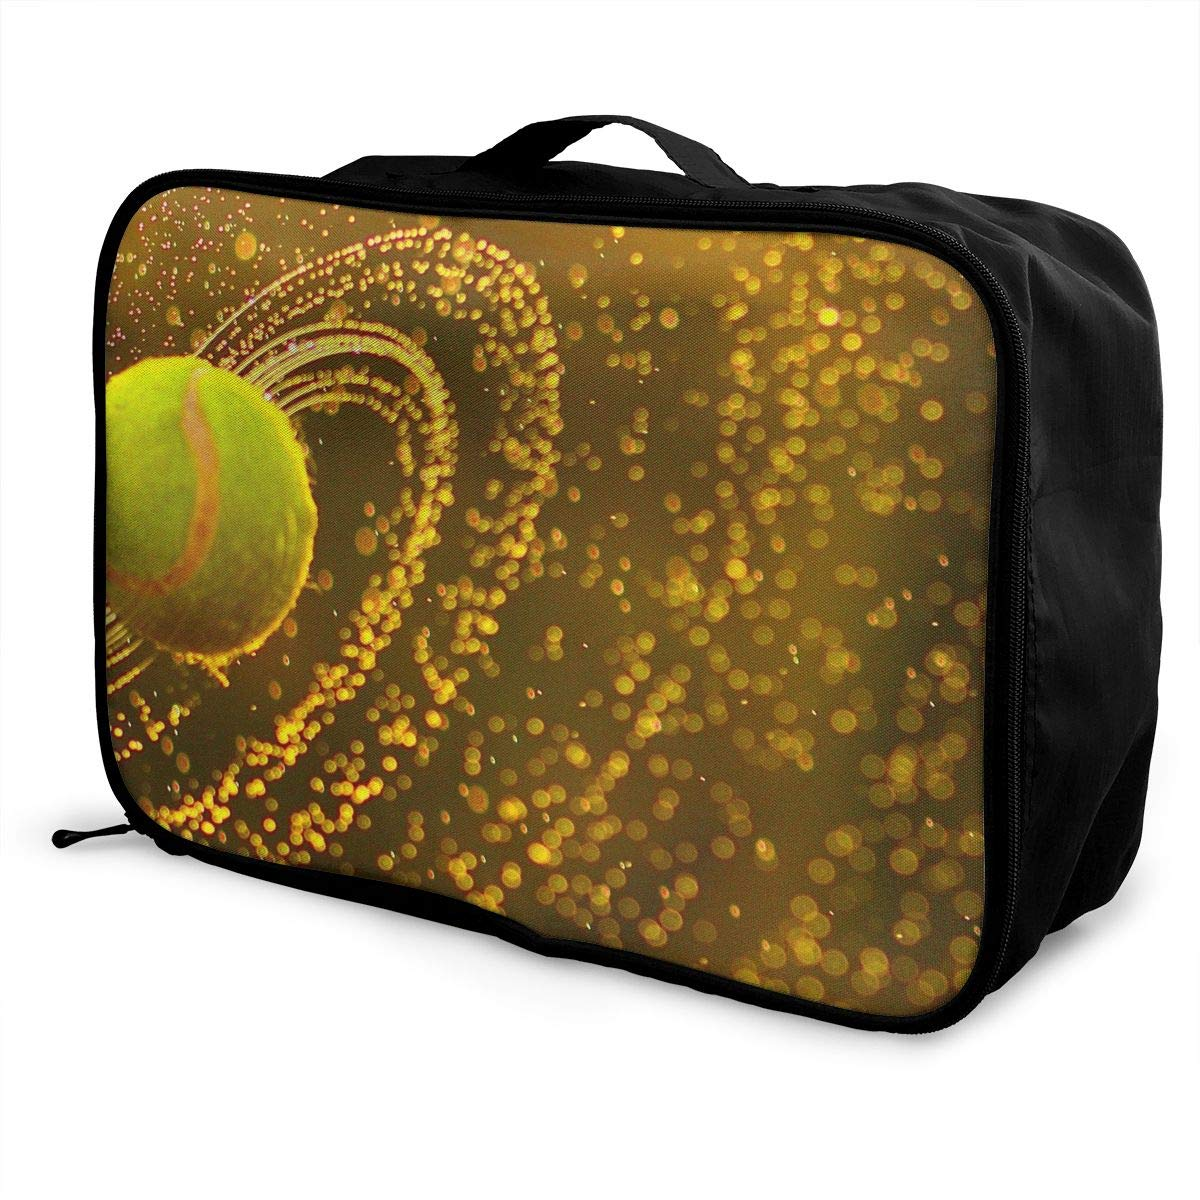 ADGAI Rotating Rain Tennis Canvas Travel Weekender Bag,Fashion Custom Lightweight Large Capacity Portable Luggage Bag,Suitcase Trolley Bag